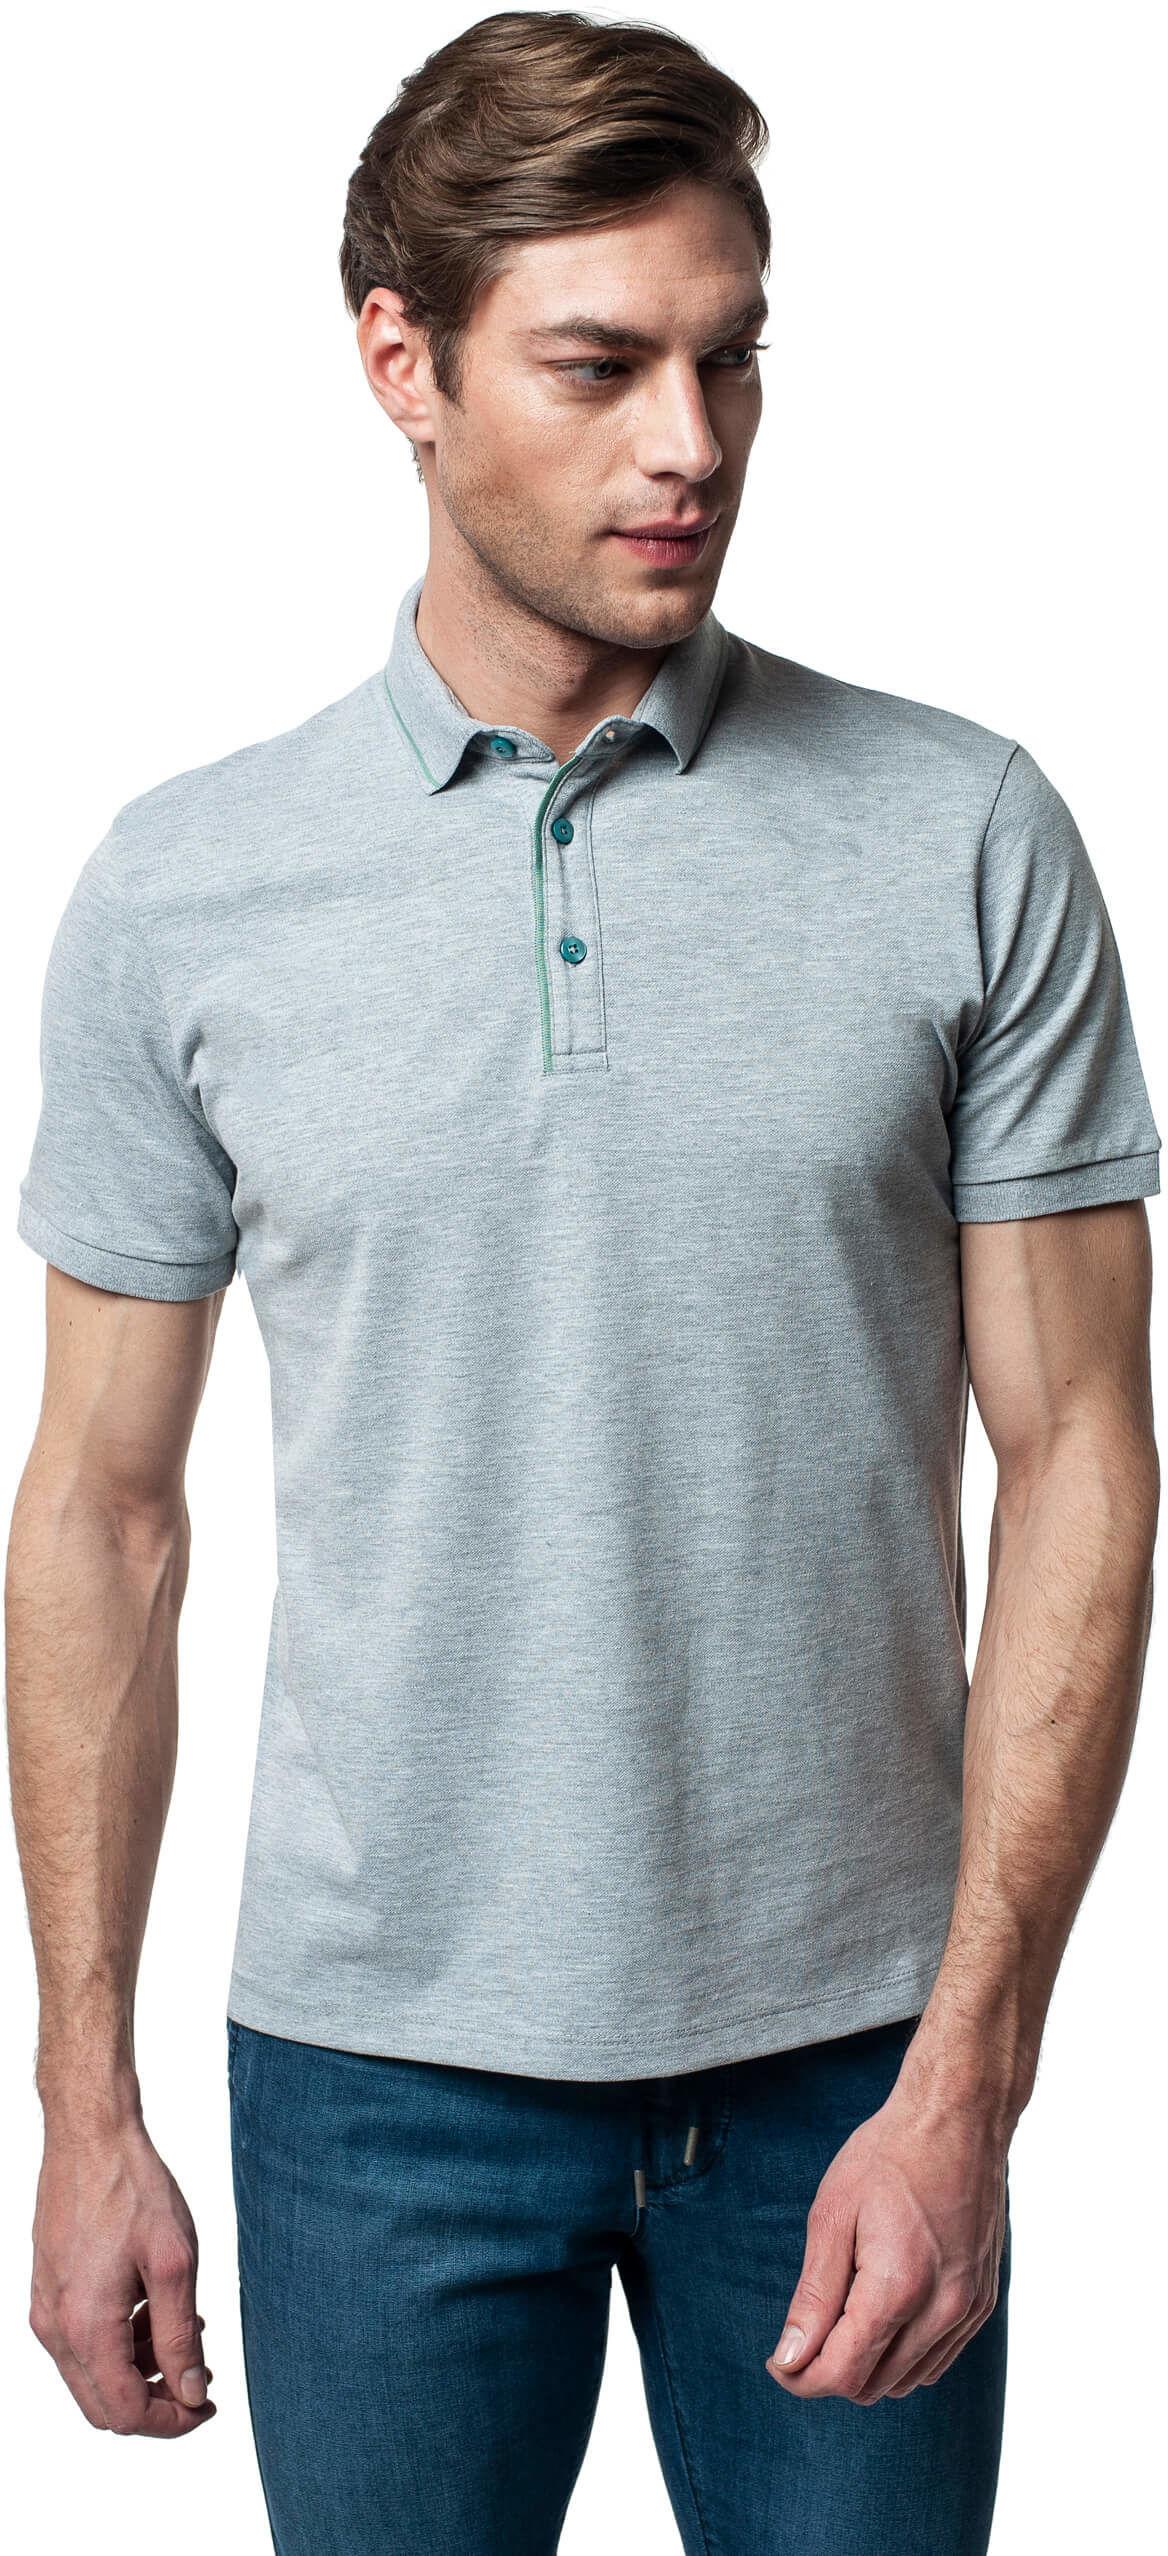 koszulka polo parilly szary